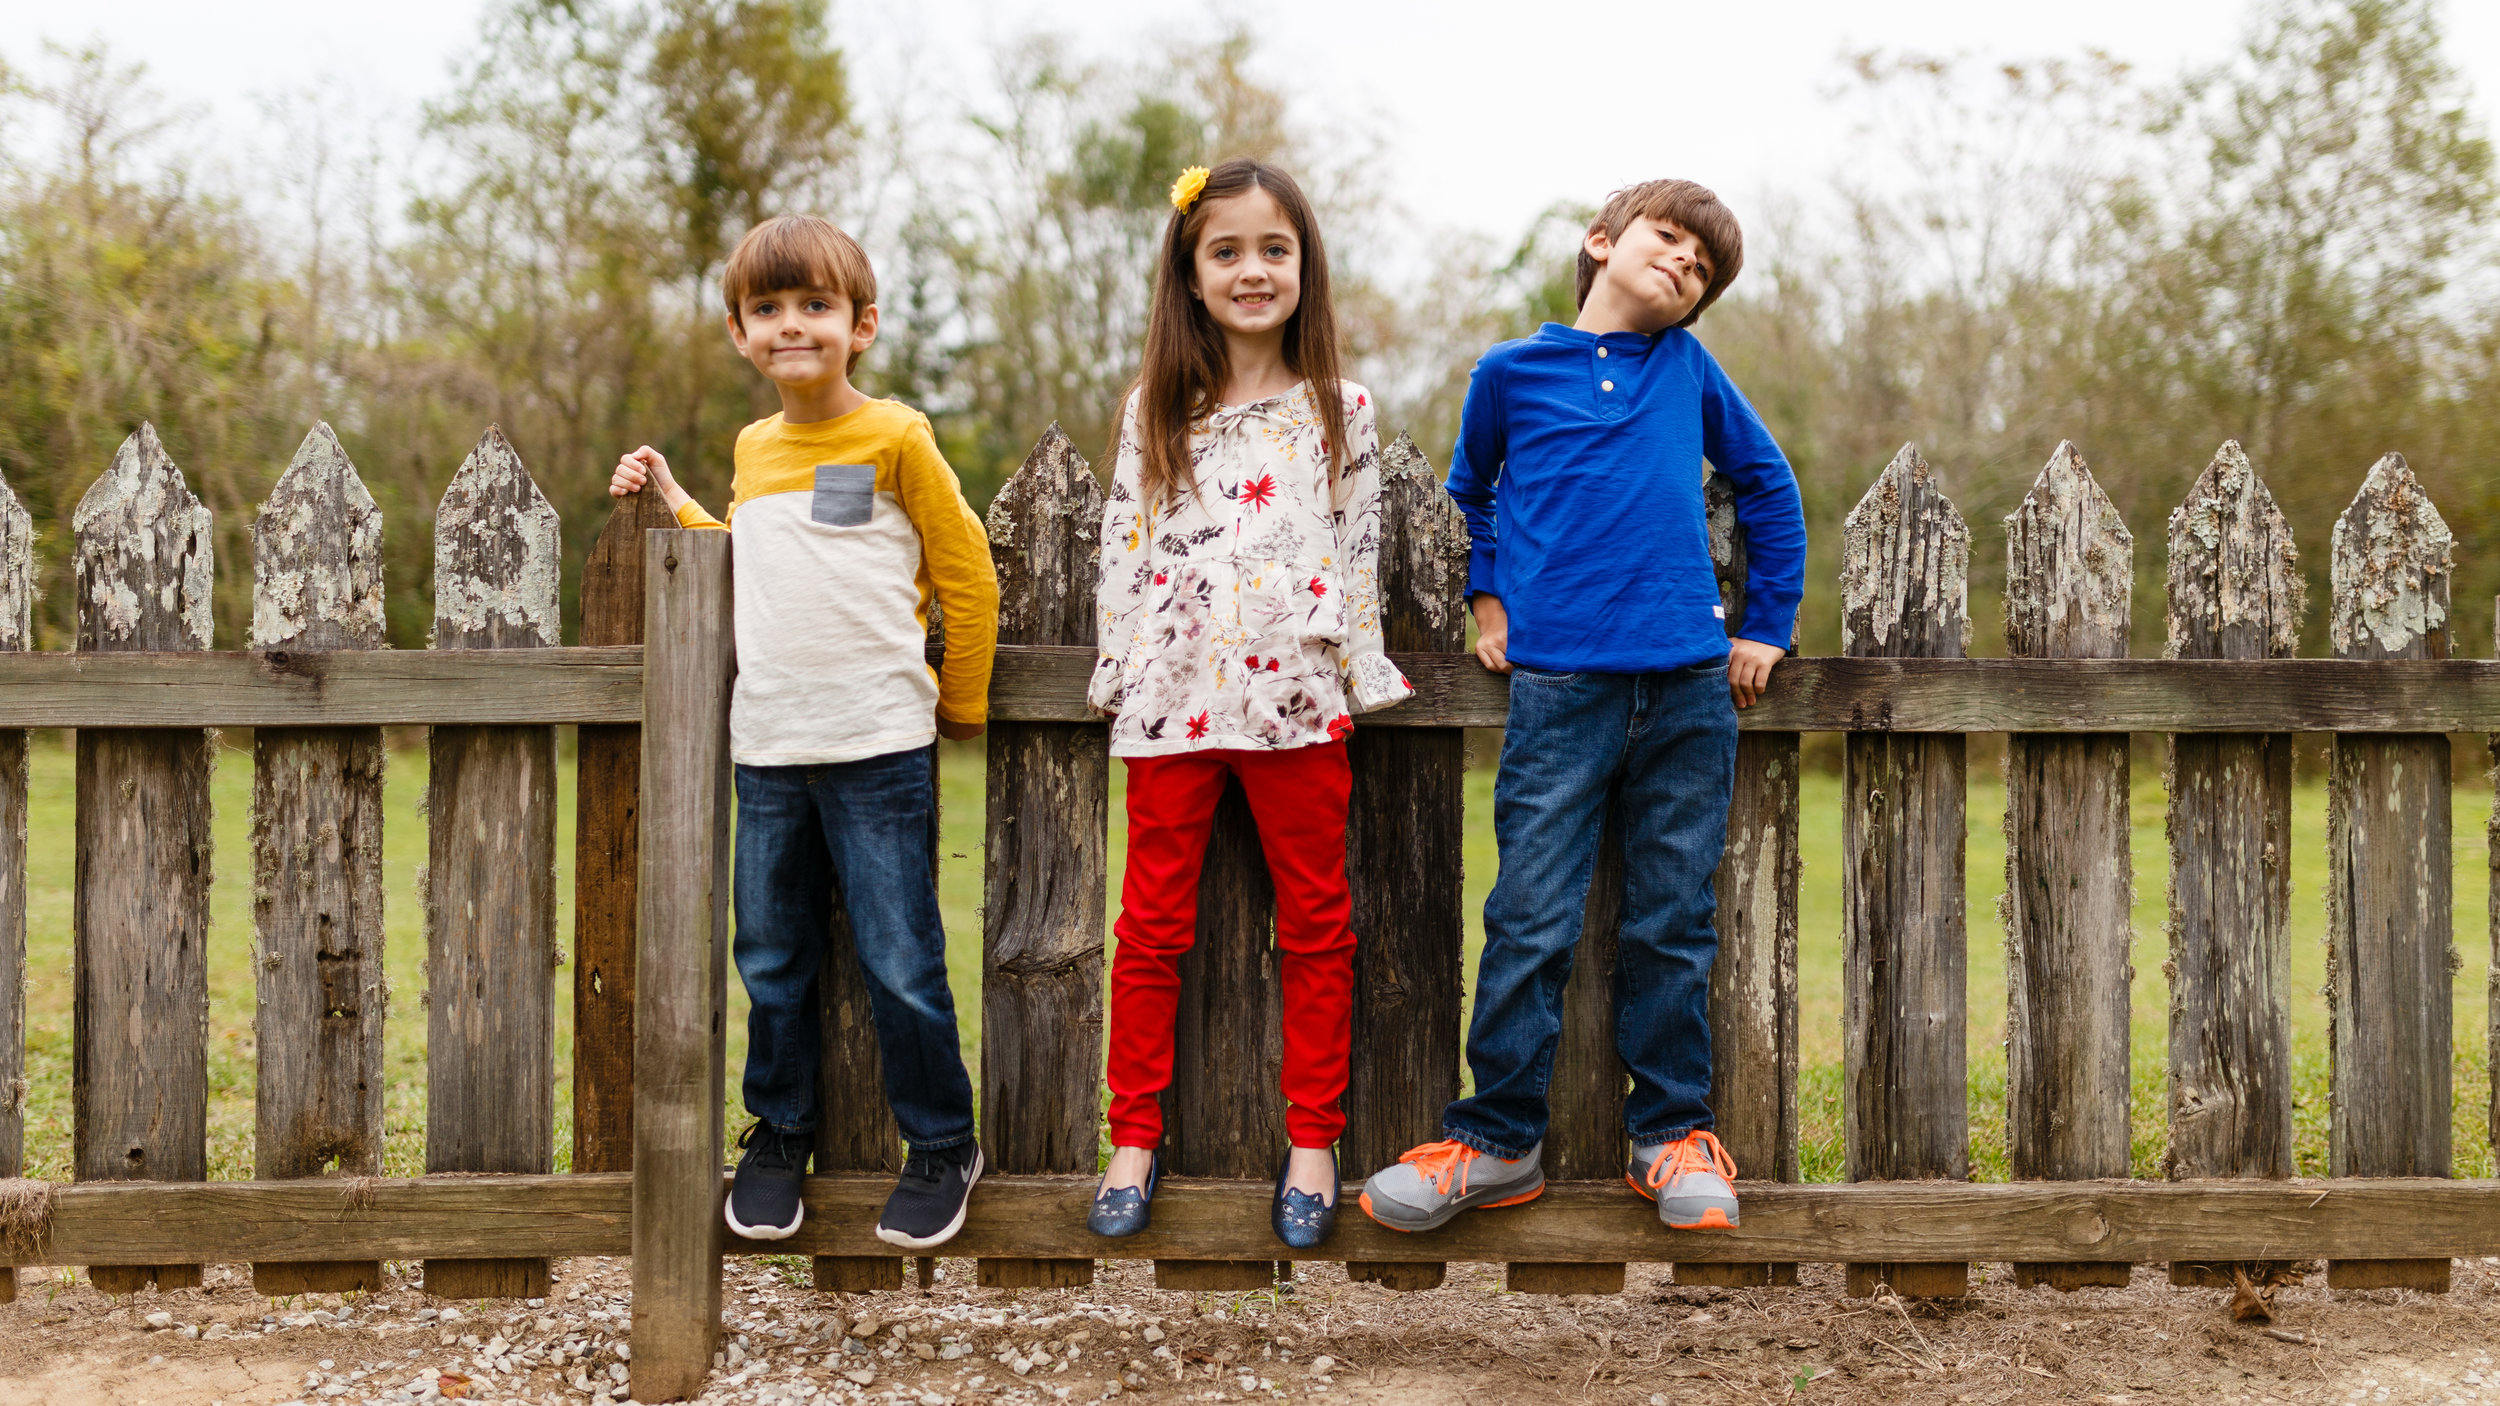 Family-child-portrait-lafayette-broussard-youngsville-photographer-6.jpg